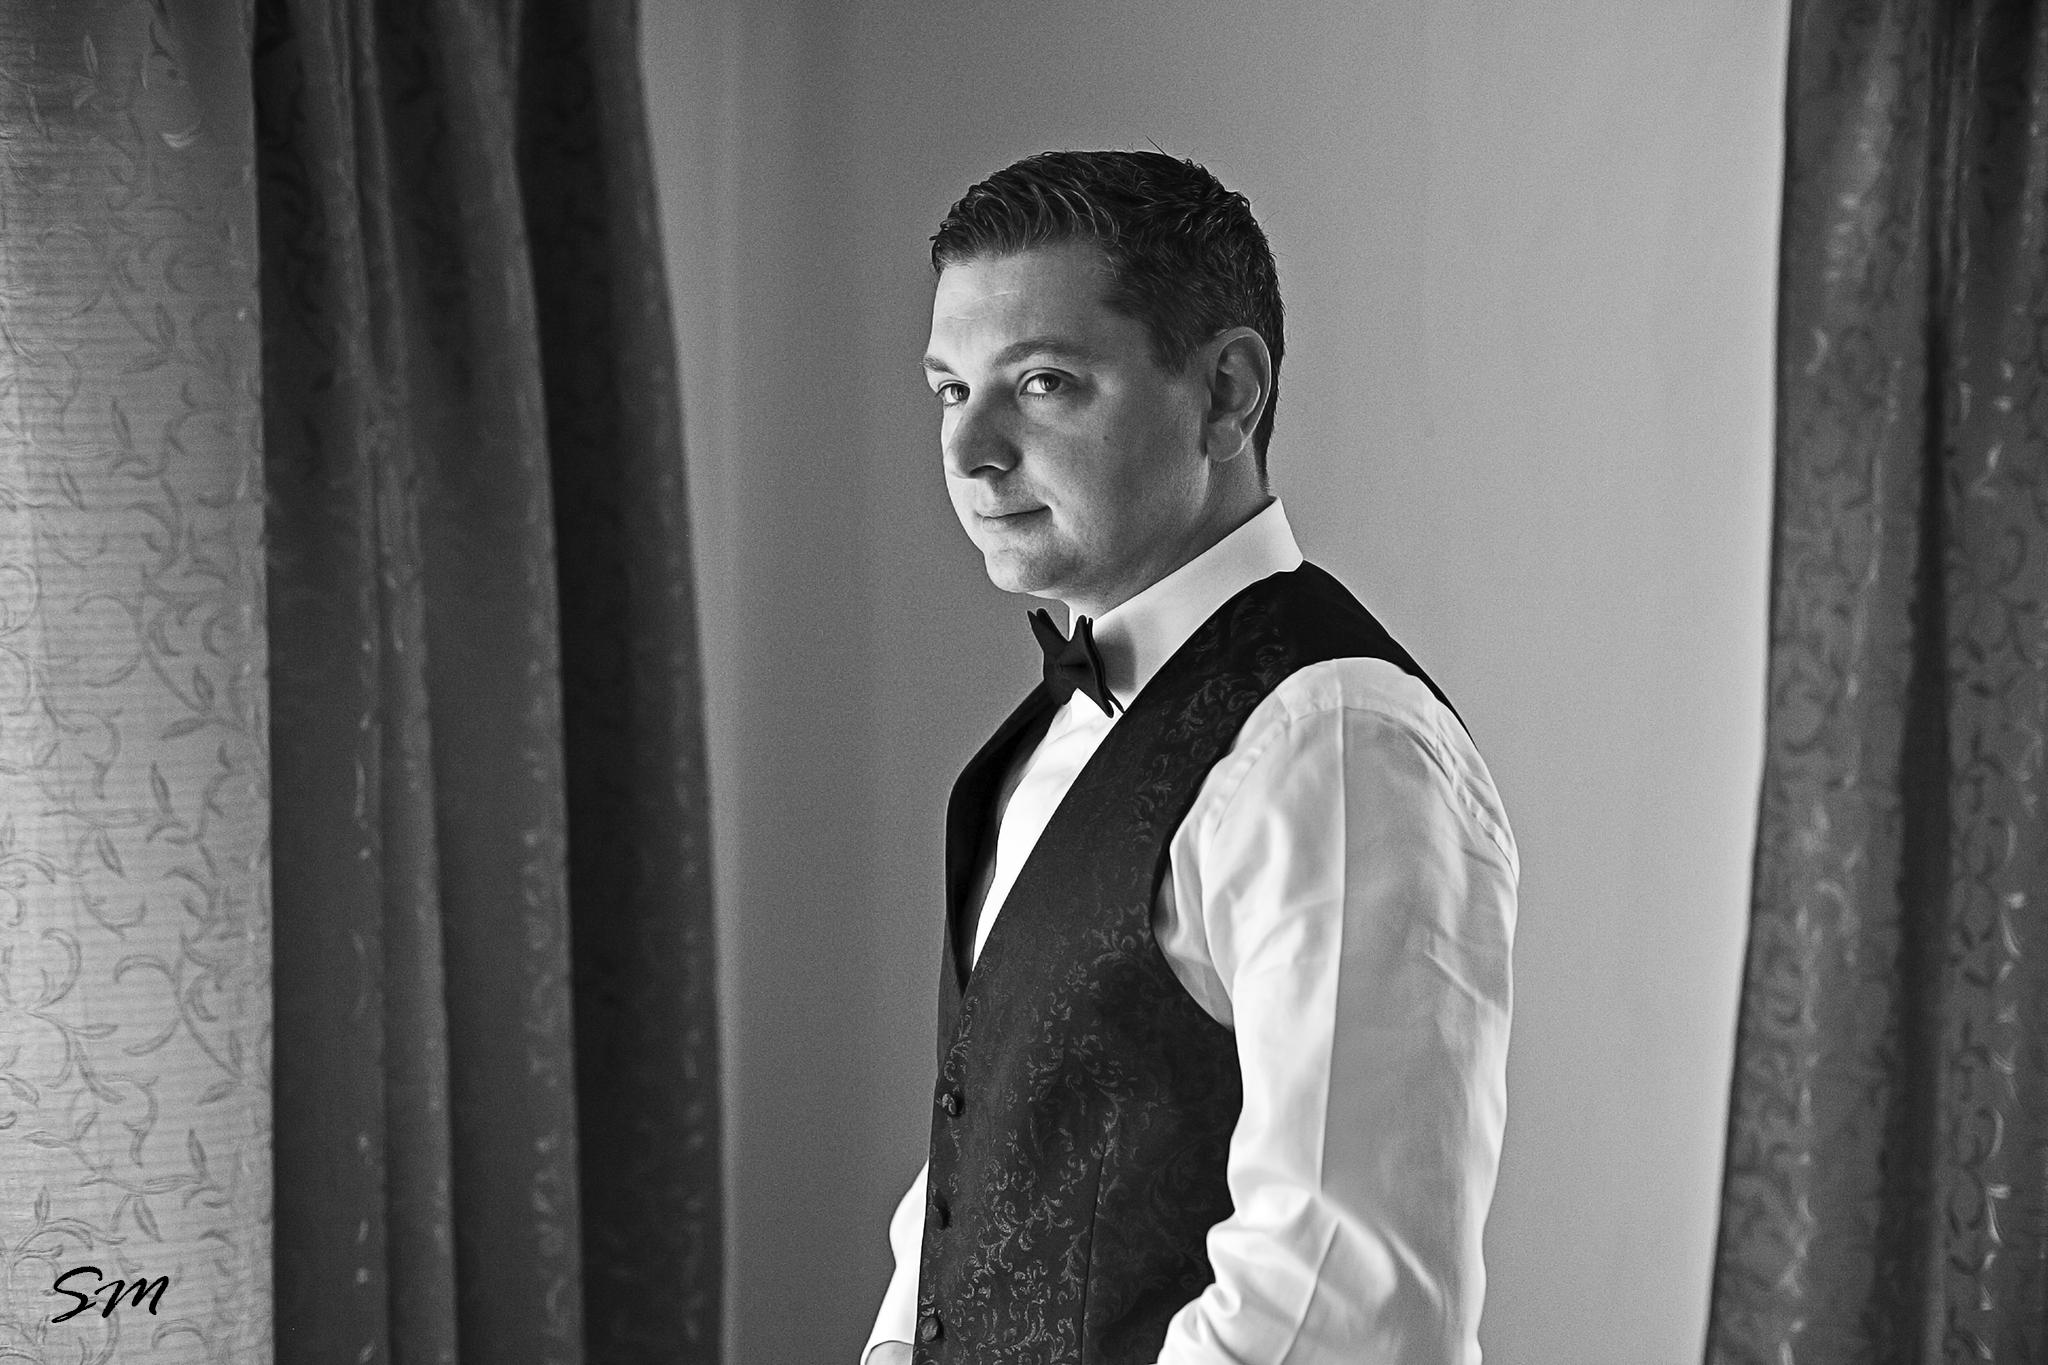 fotograf_nunta_profesionist_suceava (2)